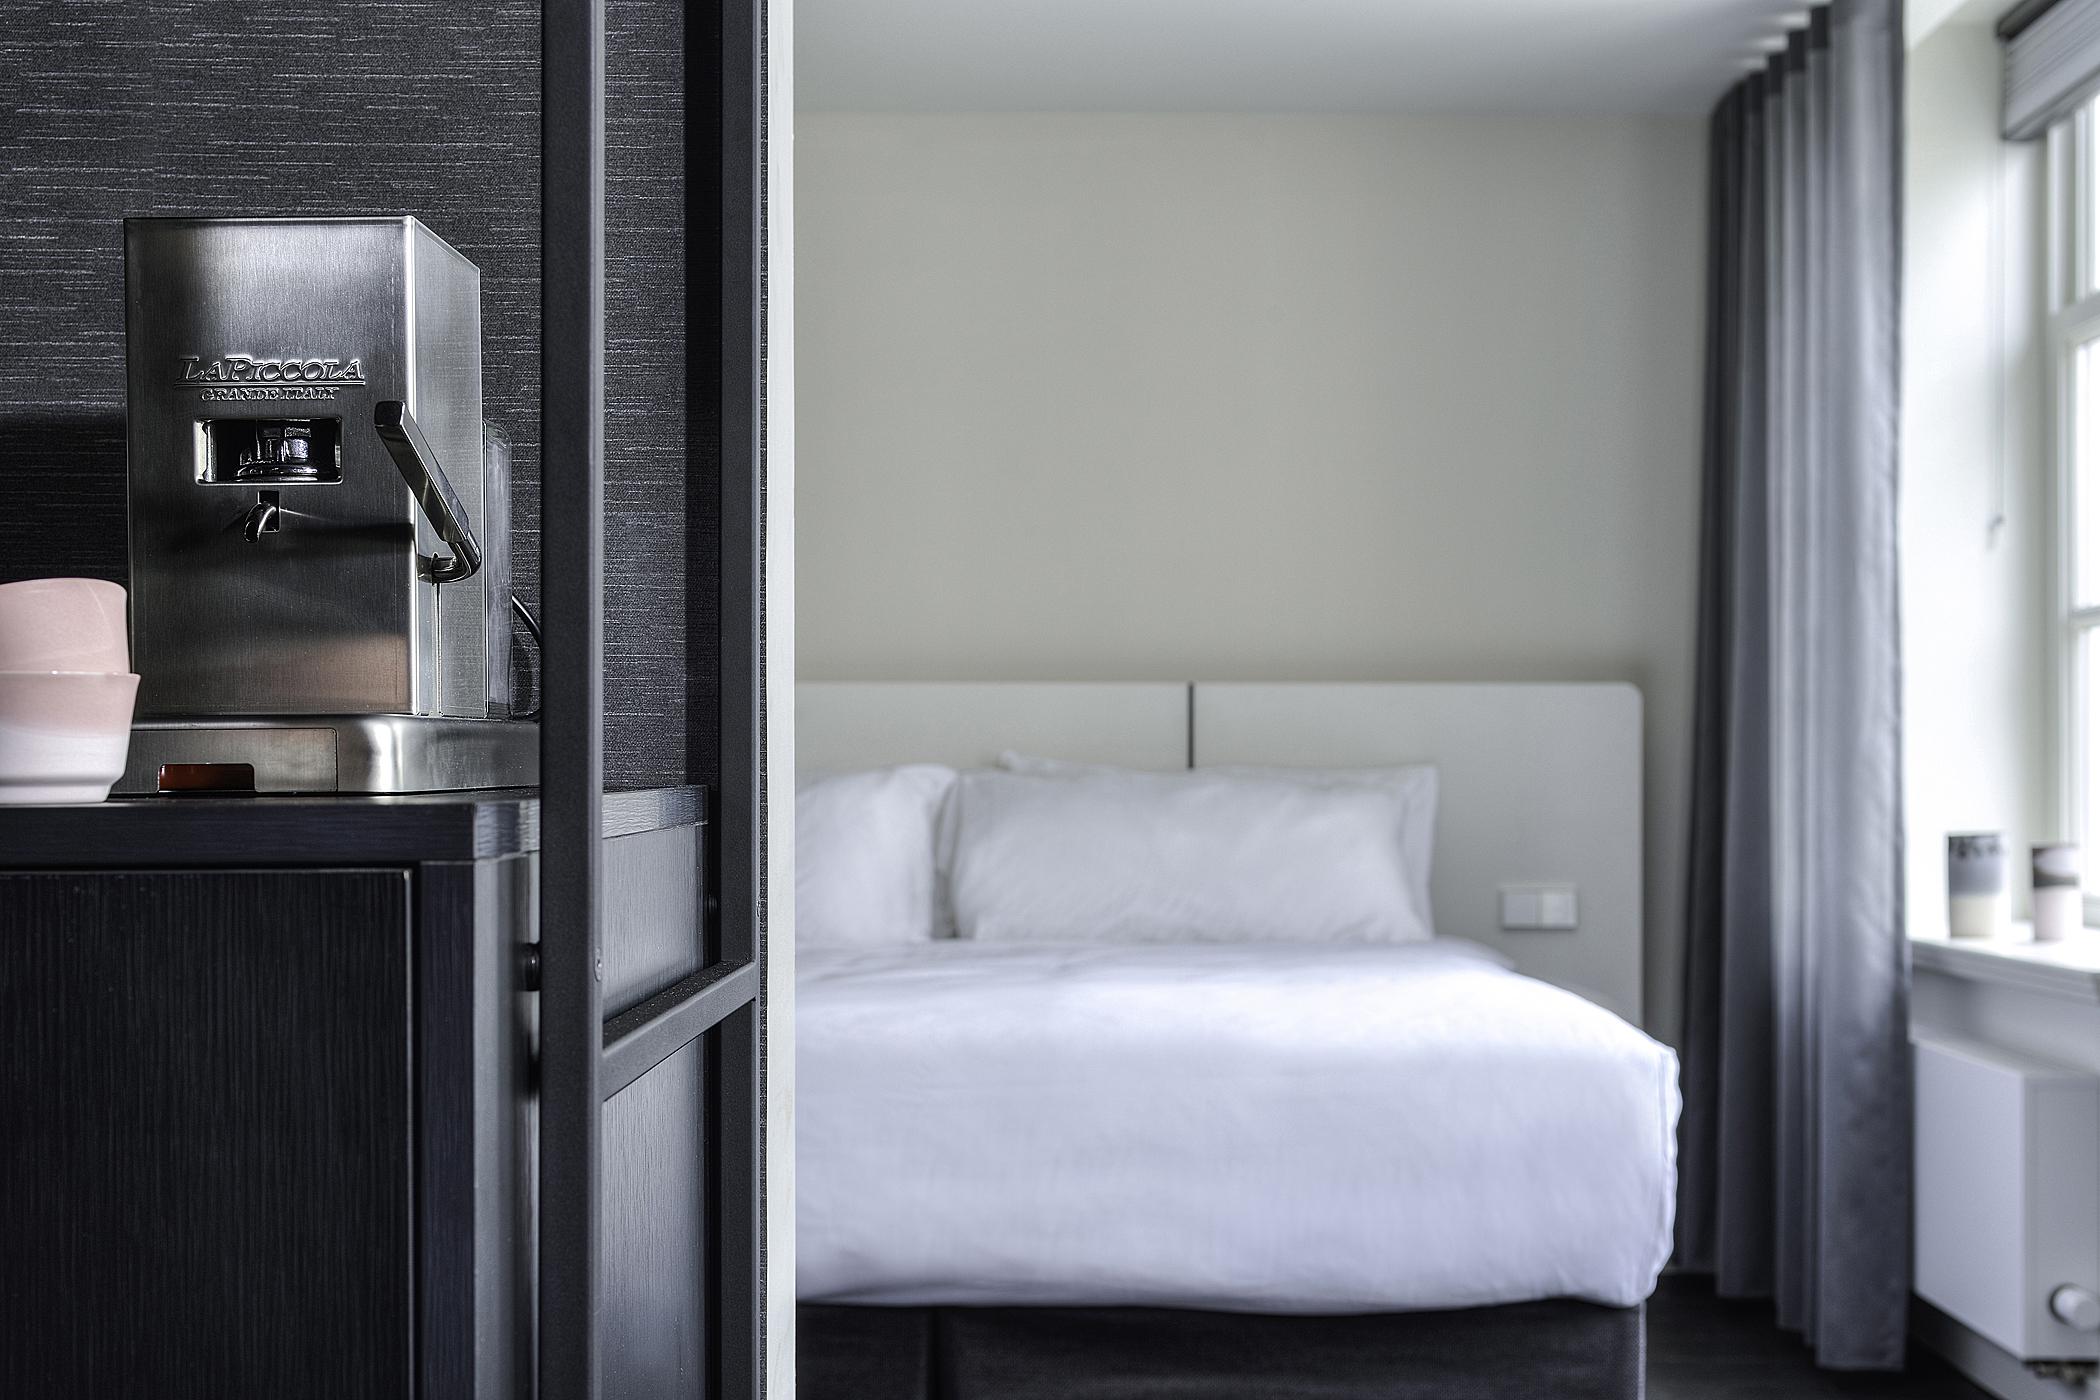 Kazerne Charming Room La Picola Bedroom Image Patrick Meis